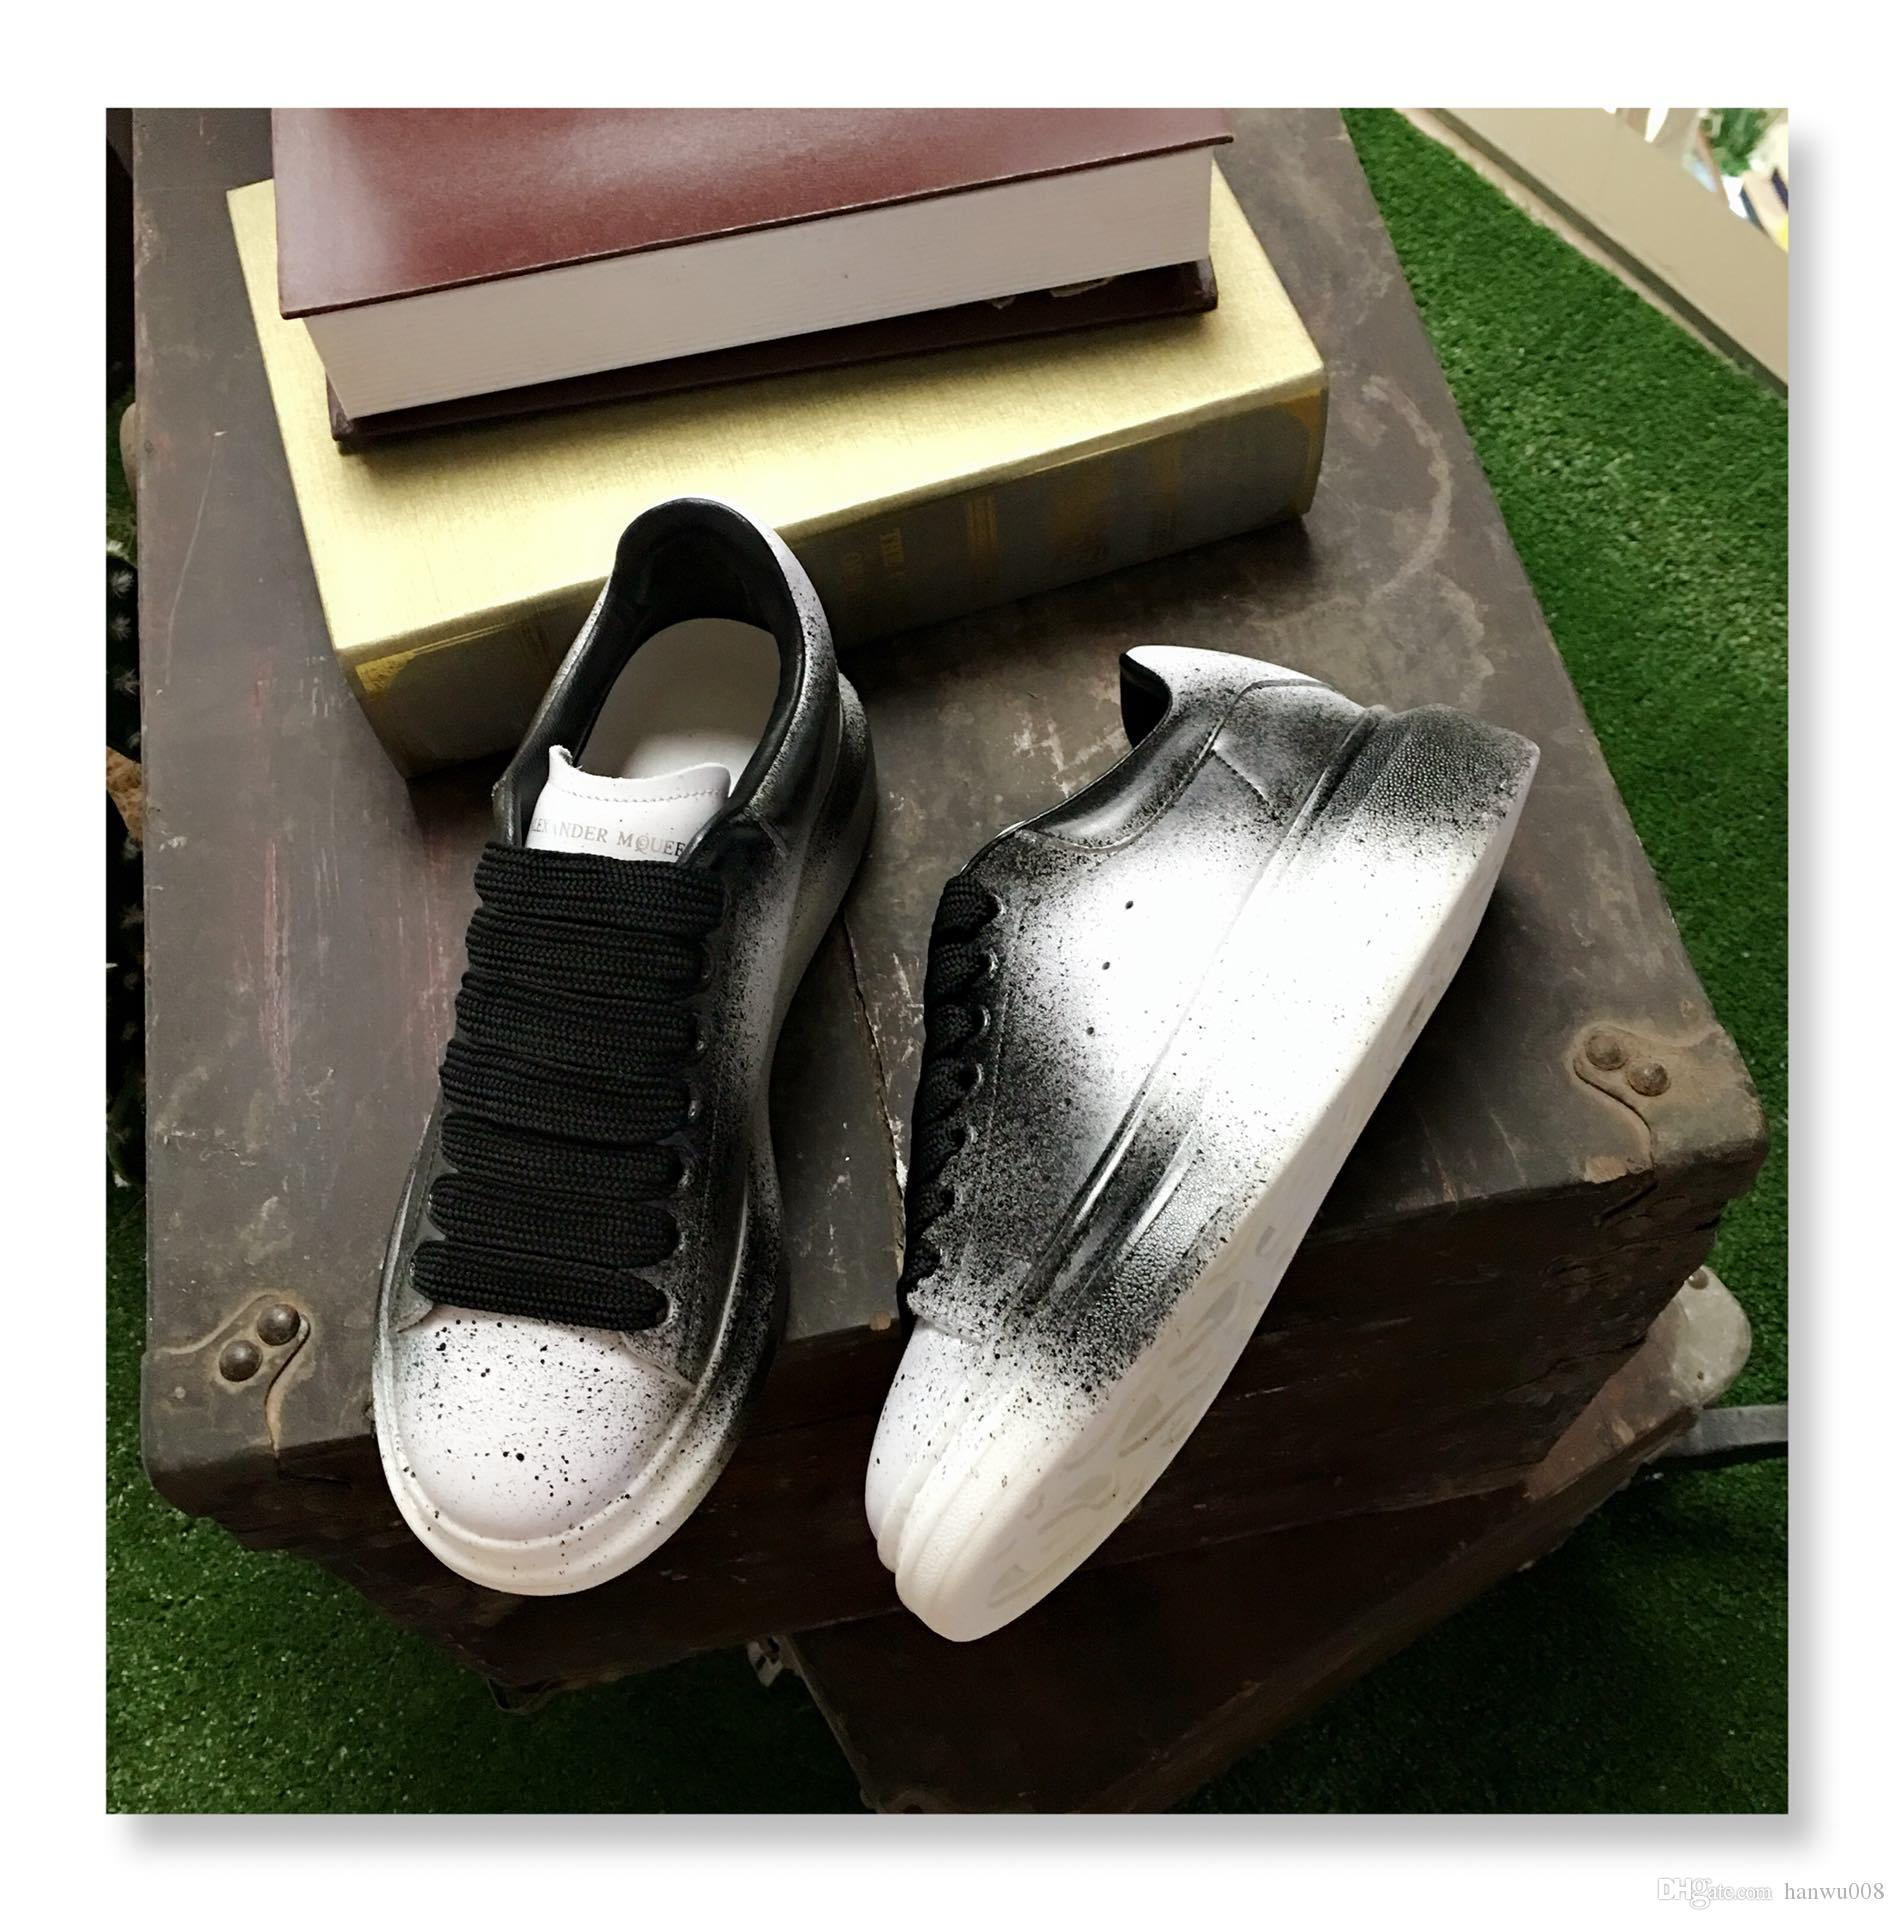 Party Schuhe Paar Edle Klassische Glitter Lady Großhandel q8tRBR